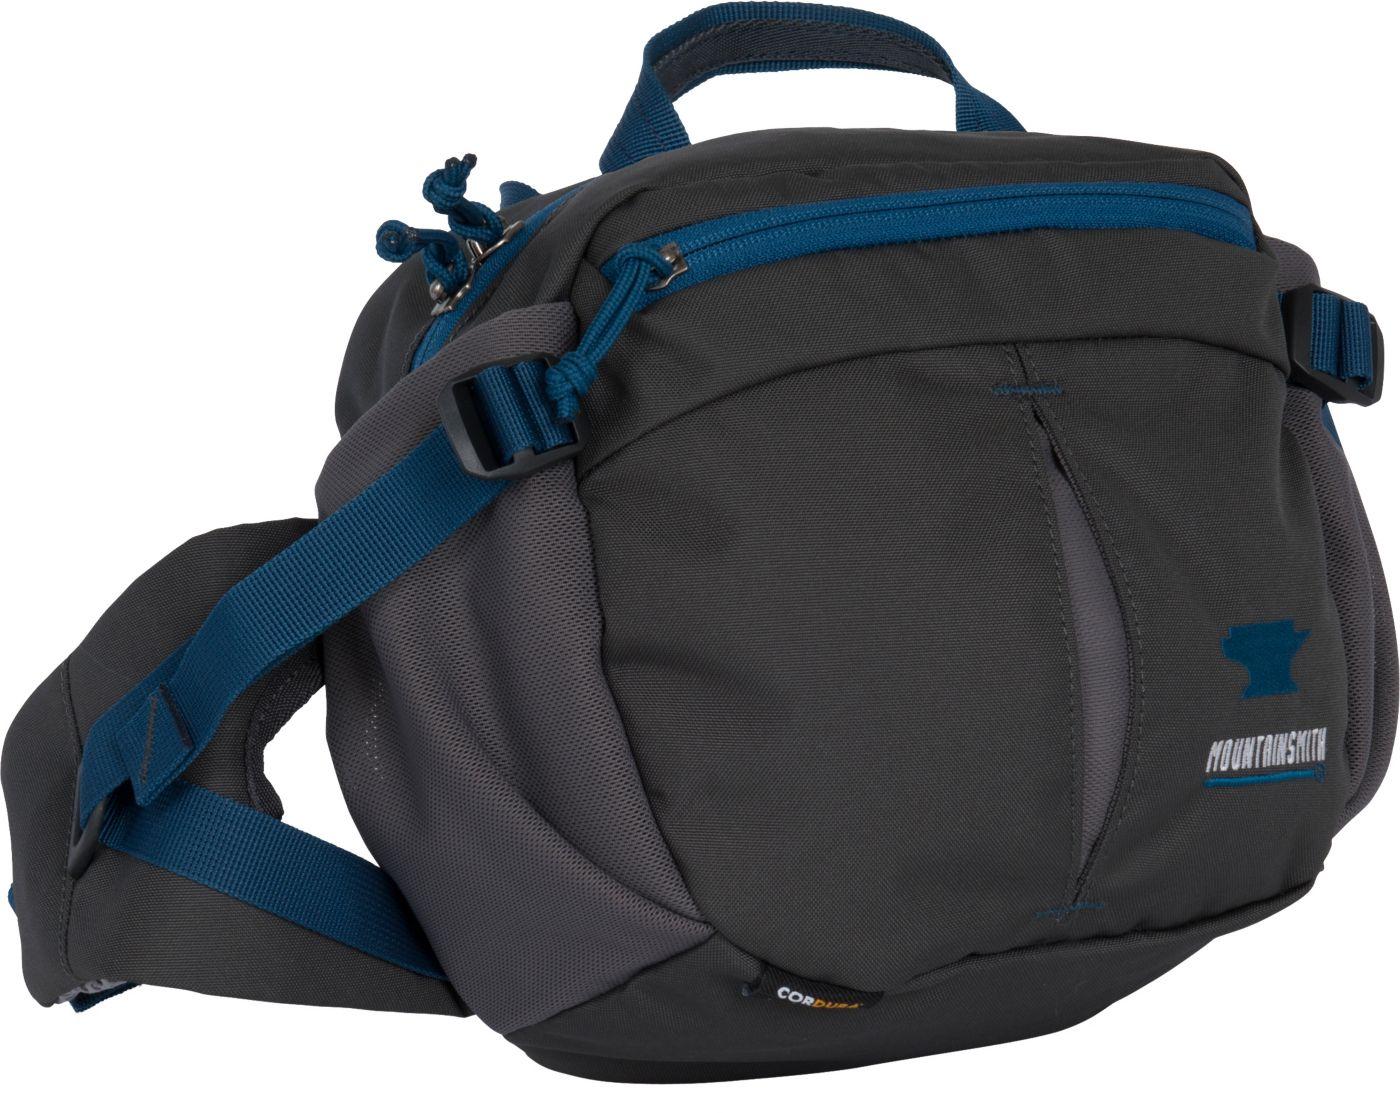 Mountainsmith Drift Lumbar Pack